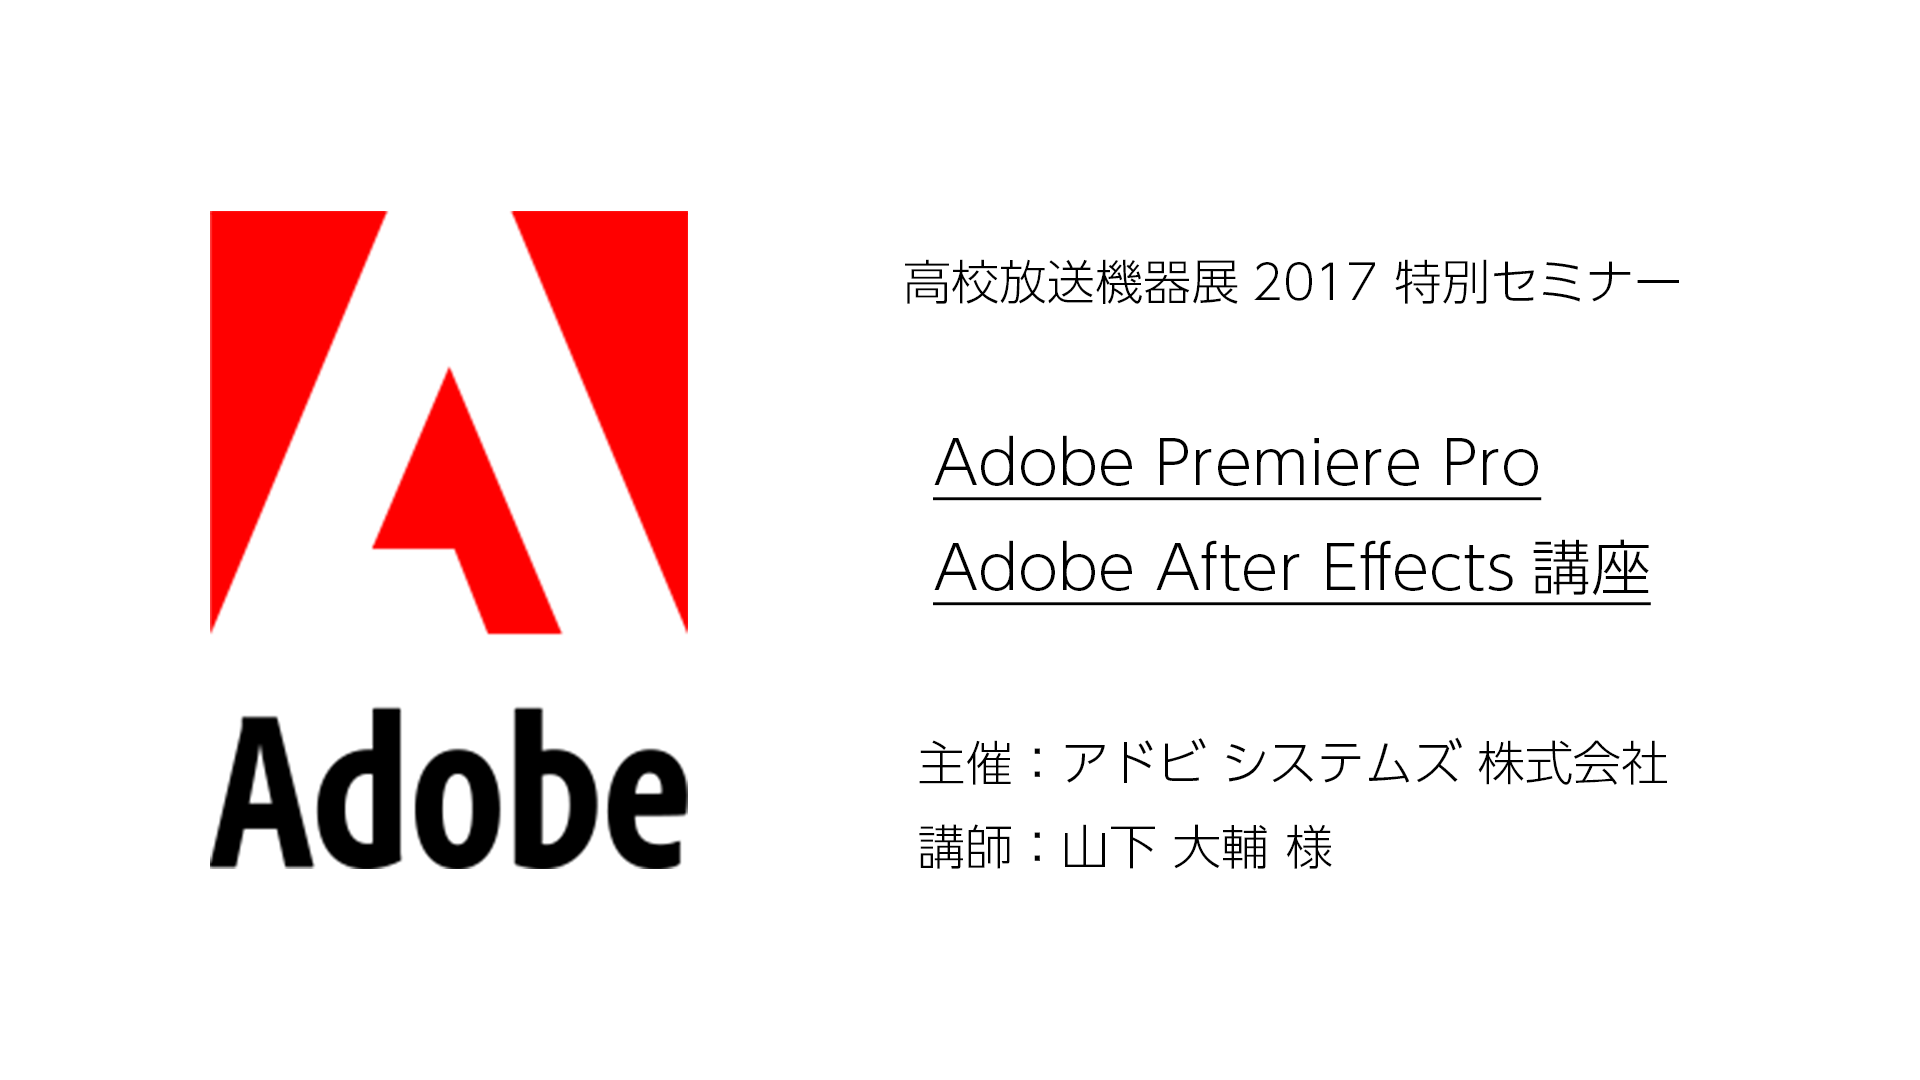 Adobe Premiere Pro・ AfterEffect講座 in HSBEE2017の動画を公開しました!